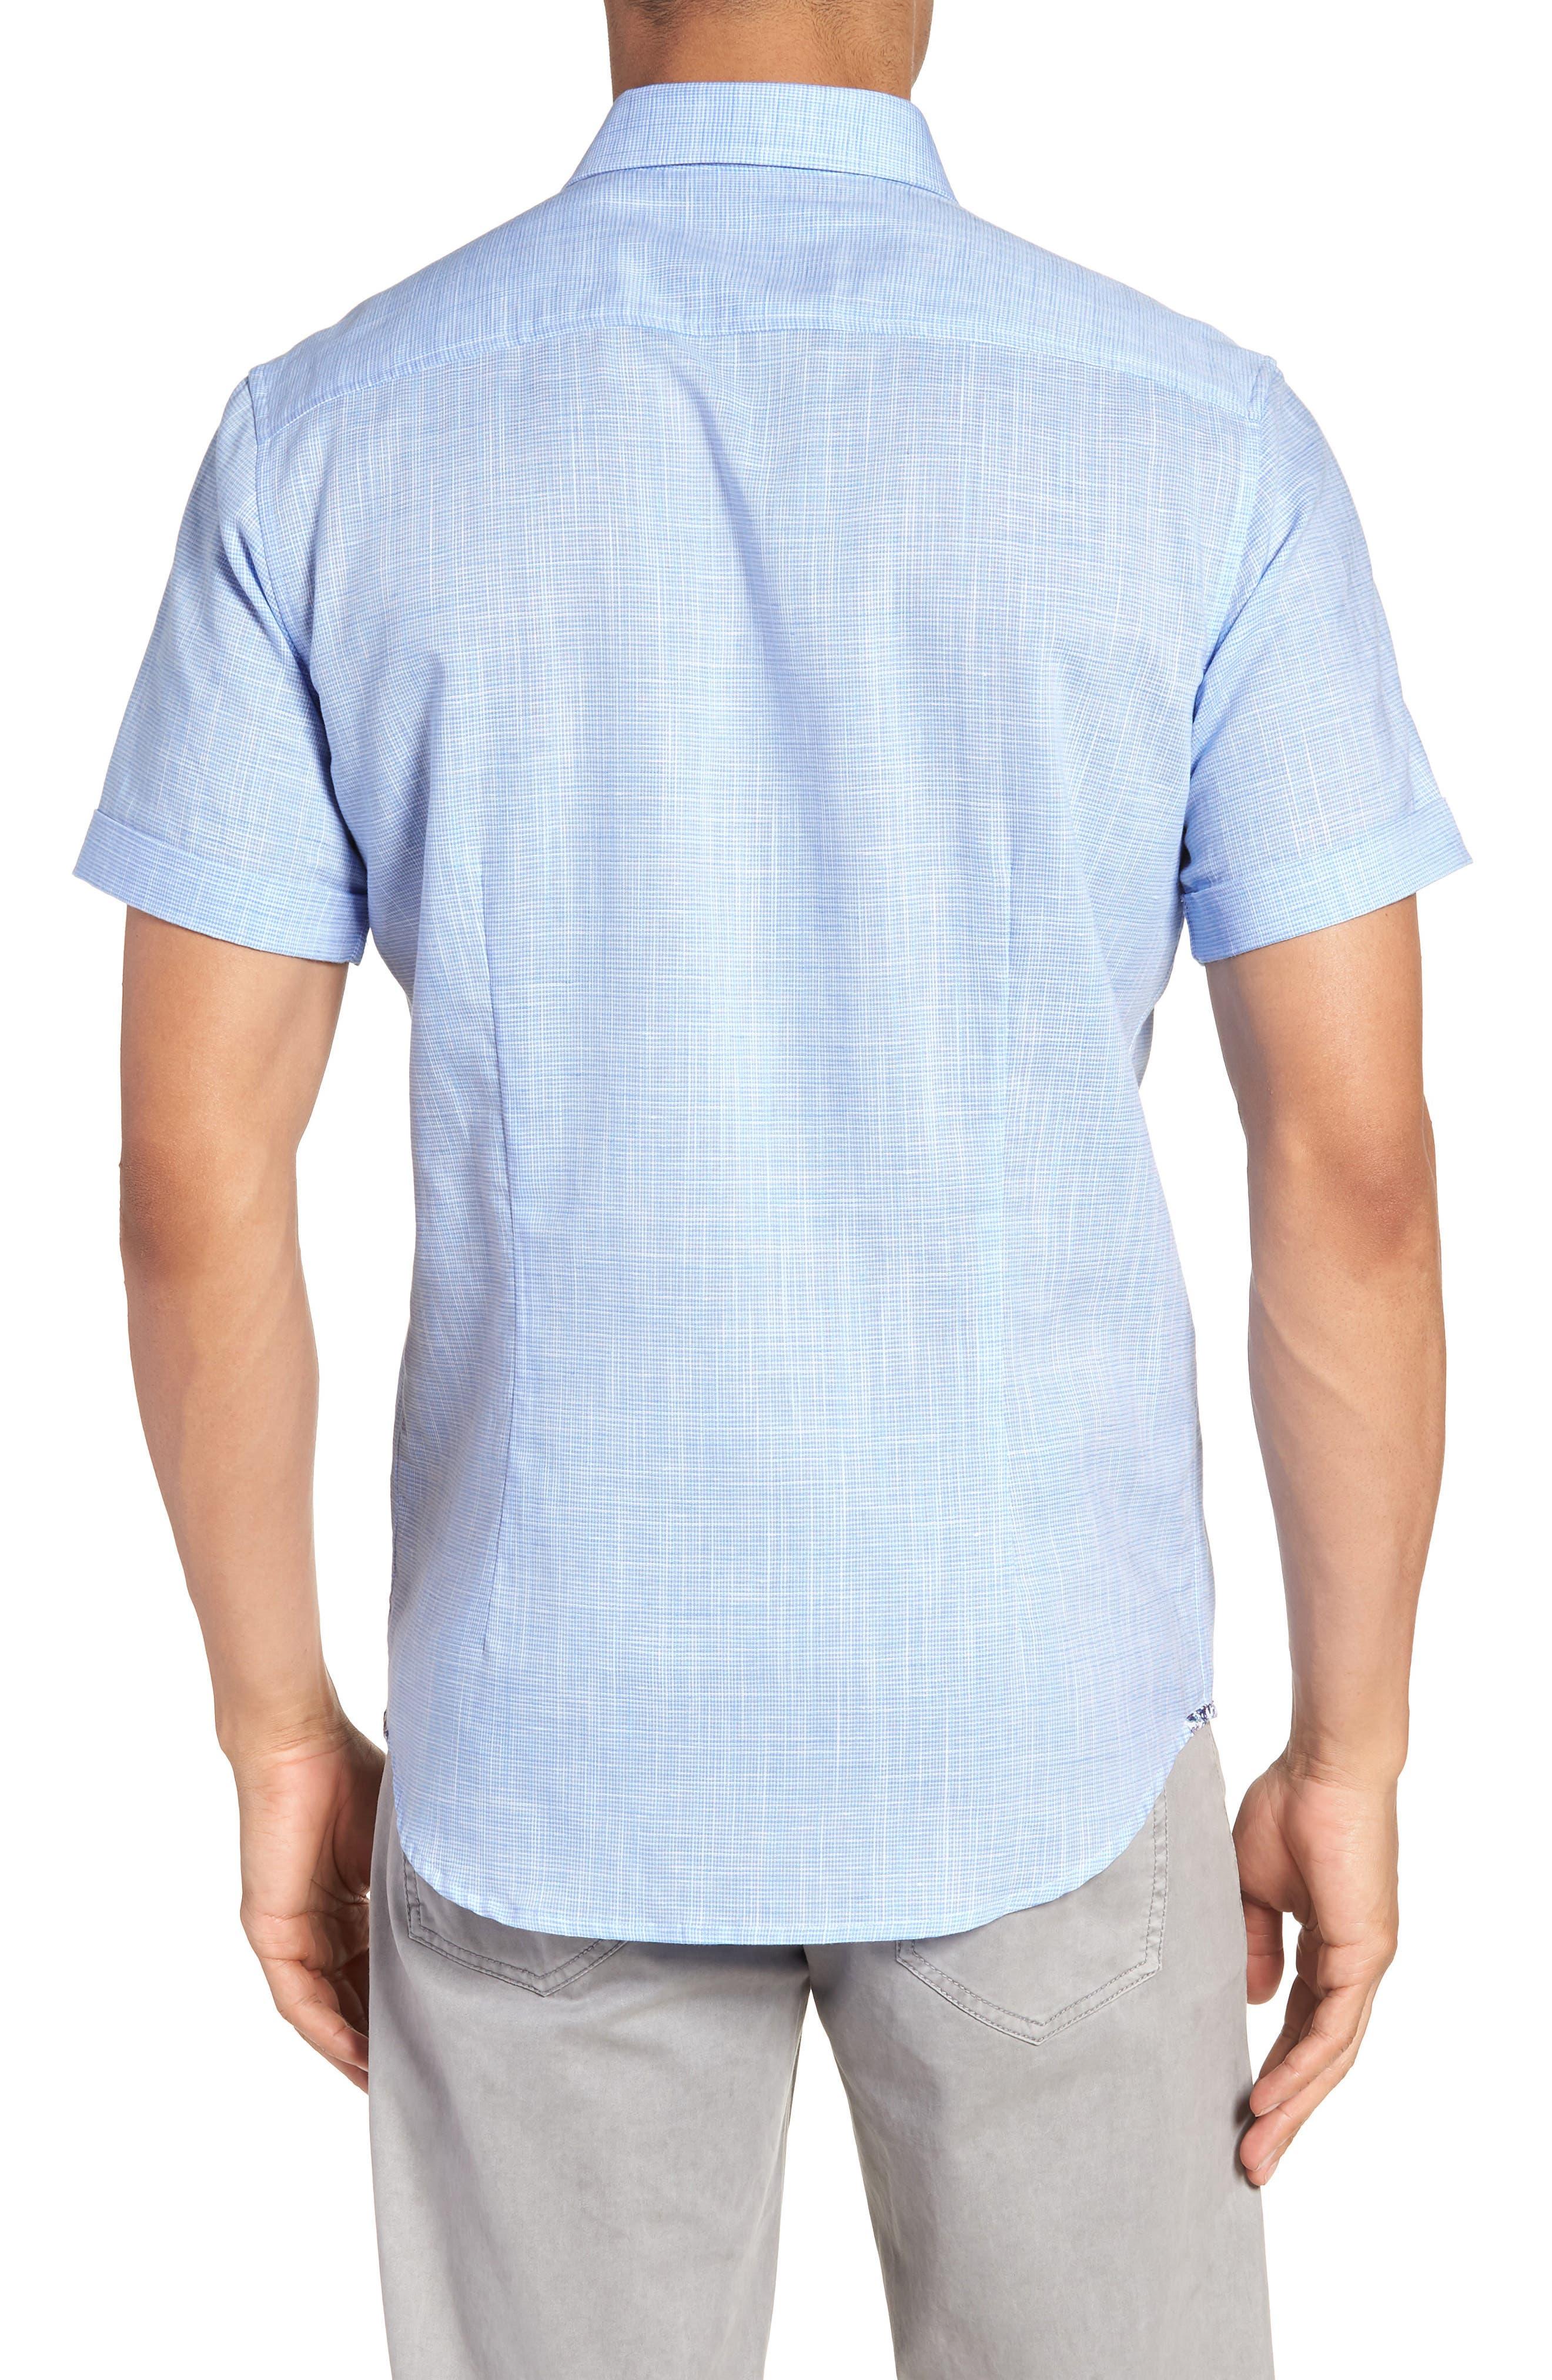 ROBERT GRAHAM,                             Isia Tailored Fit Sport Shirt,                             Alternate thumbnail 2, color,                             400